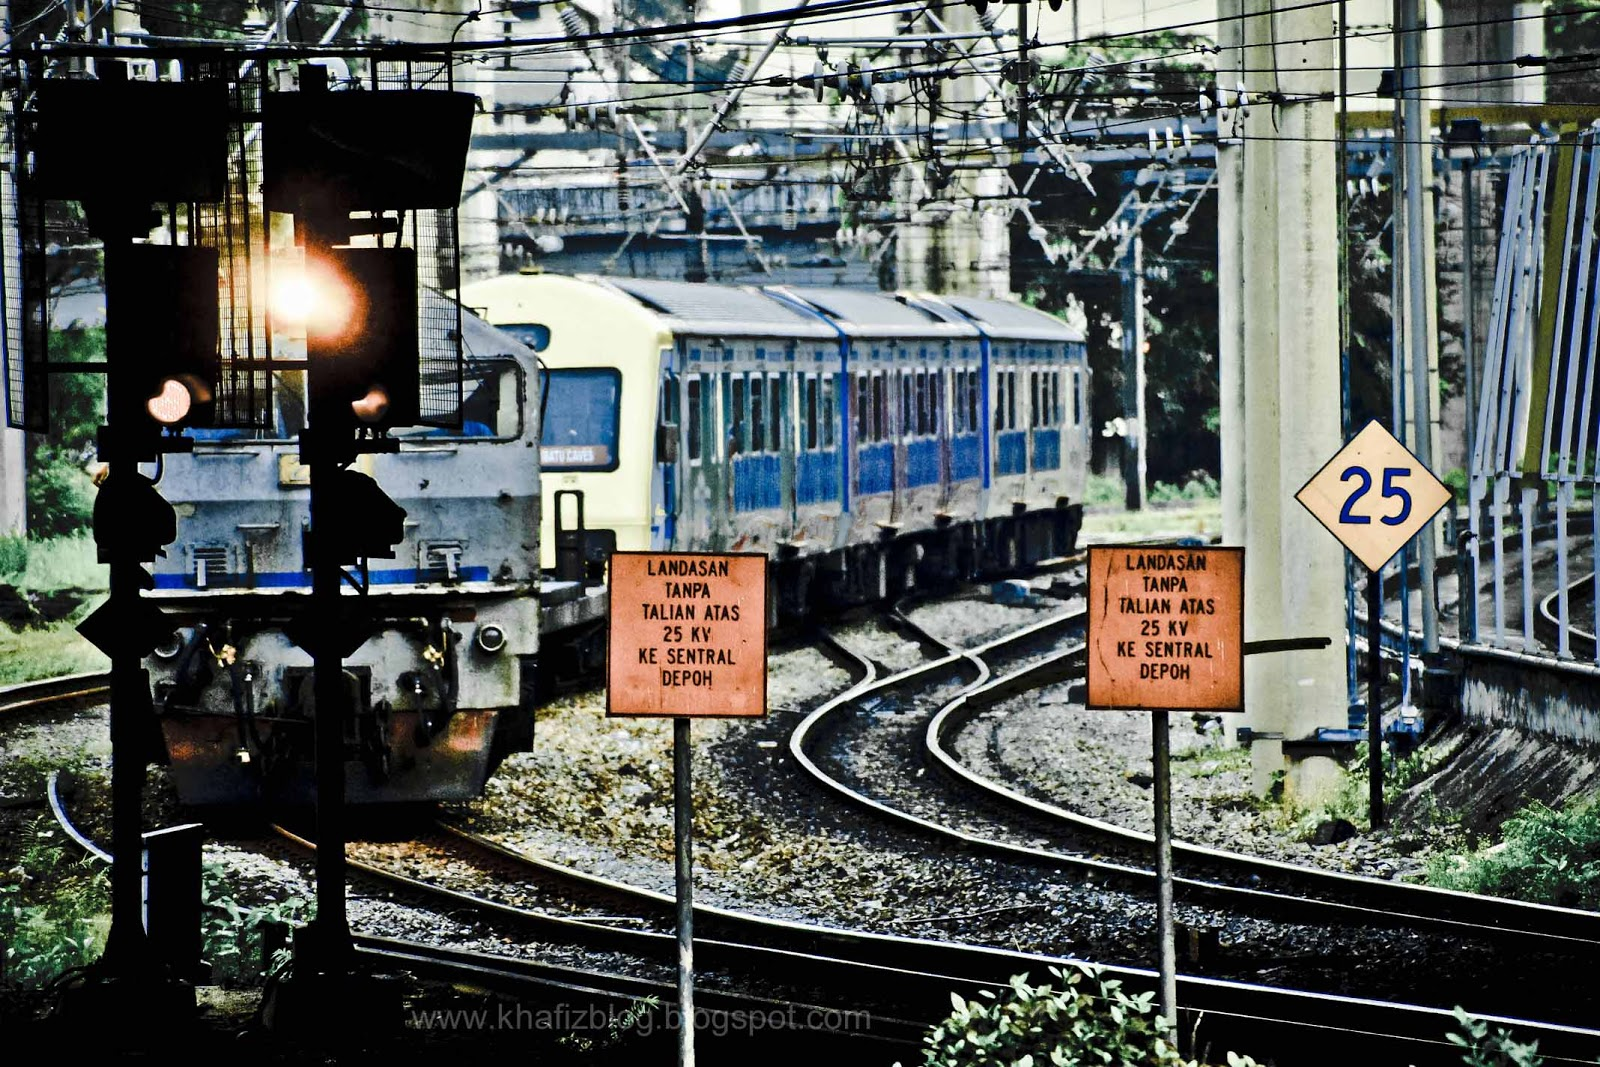 ktm malaysian railways Phone number of ktm malaysia is +603 22671200 / 603-22631111 ktm malaysia is originally known with the name of keretapi tanah melayu berhad is a railway body that.